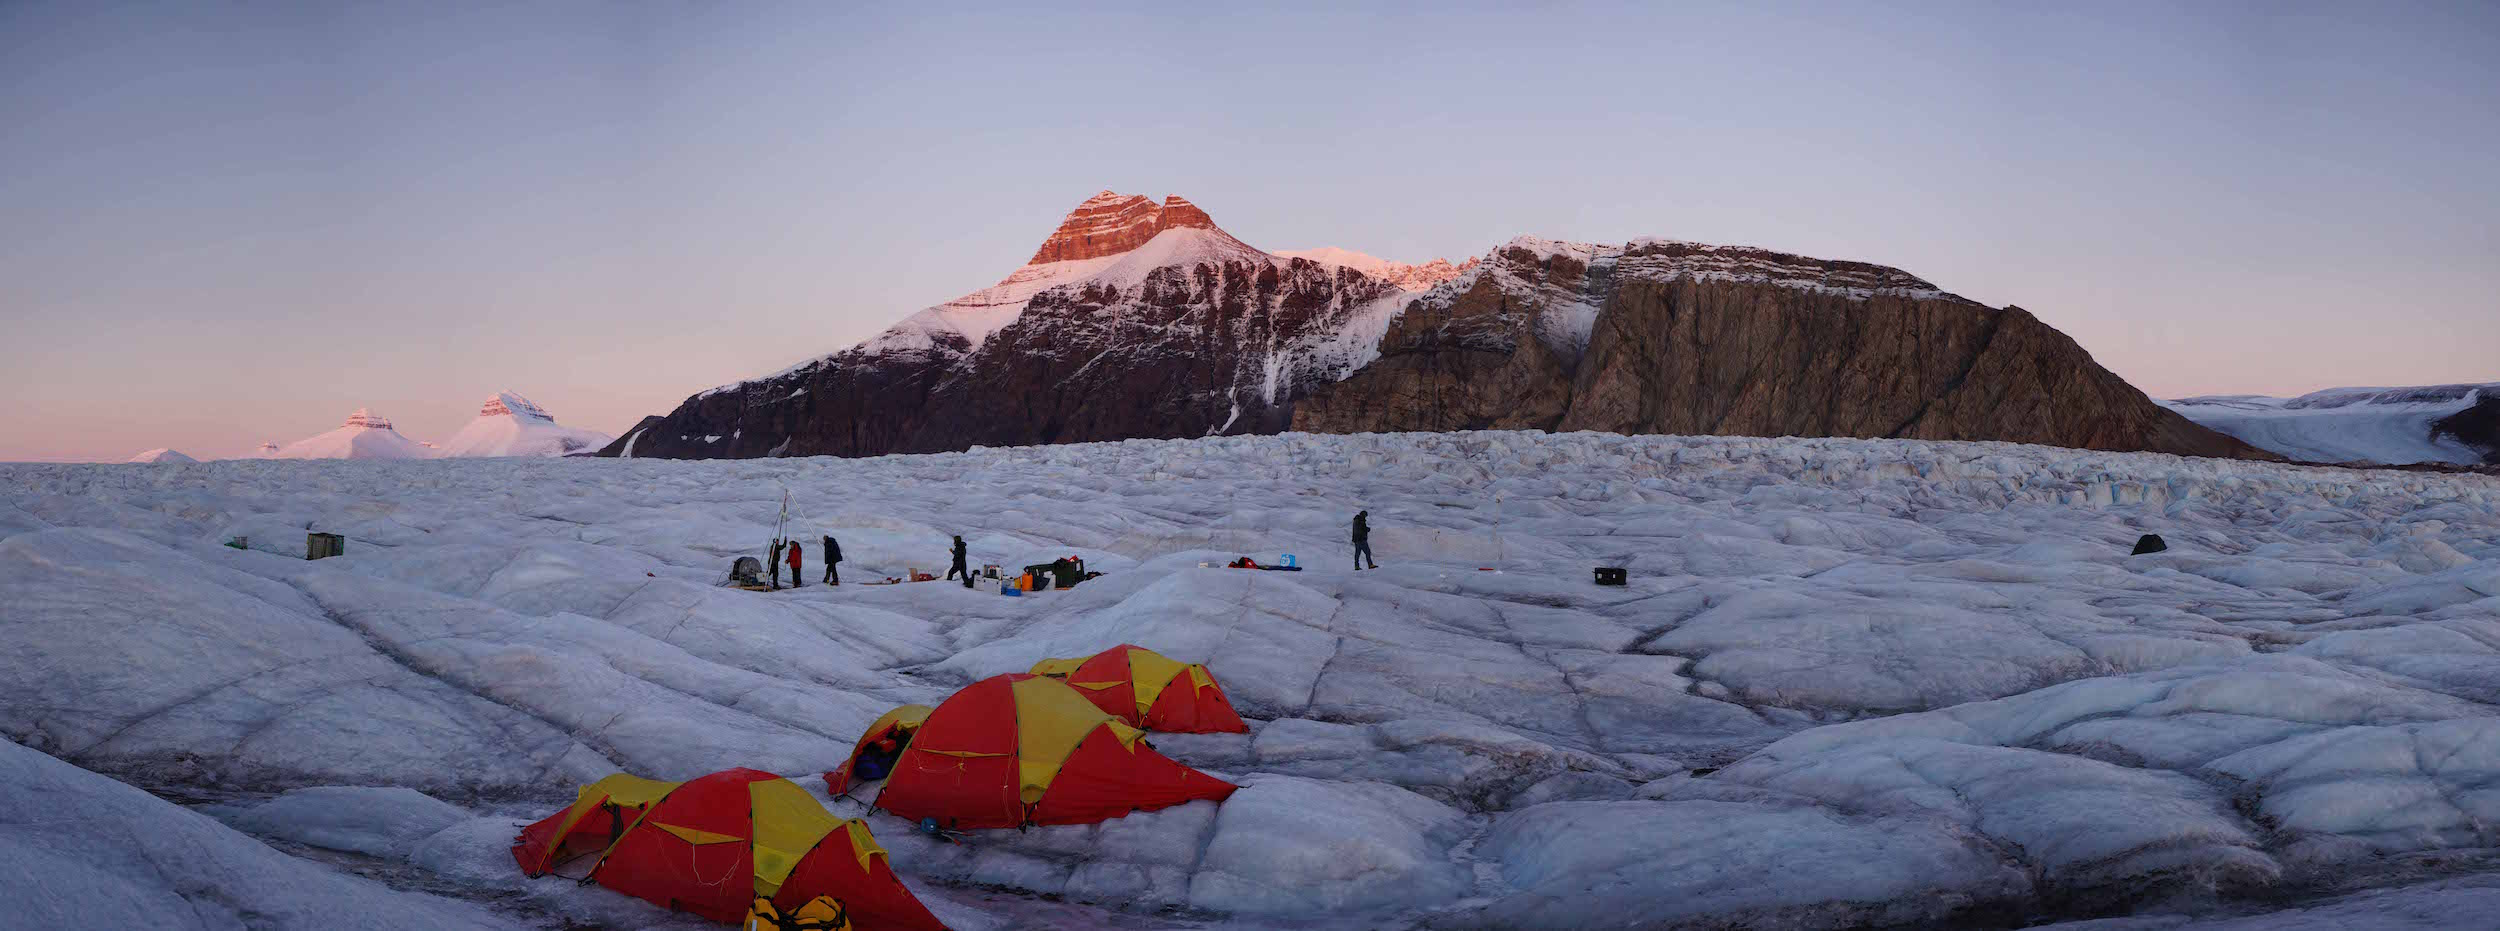 UNIS field camp on Kronebreen in Kongsfjorden, Svalbard. Photo: Heïdi Sevestre / UNIS